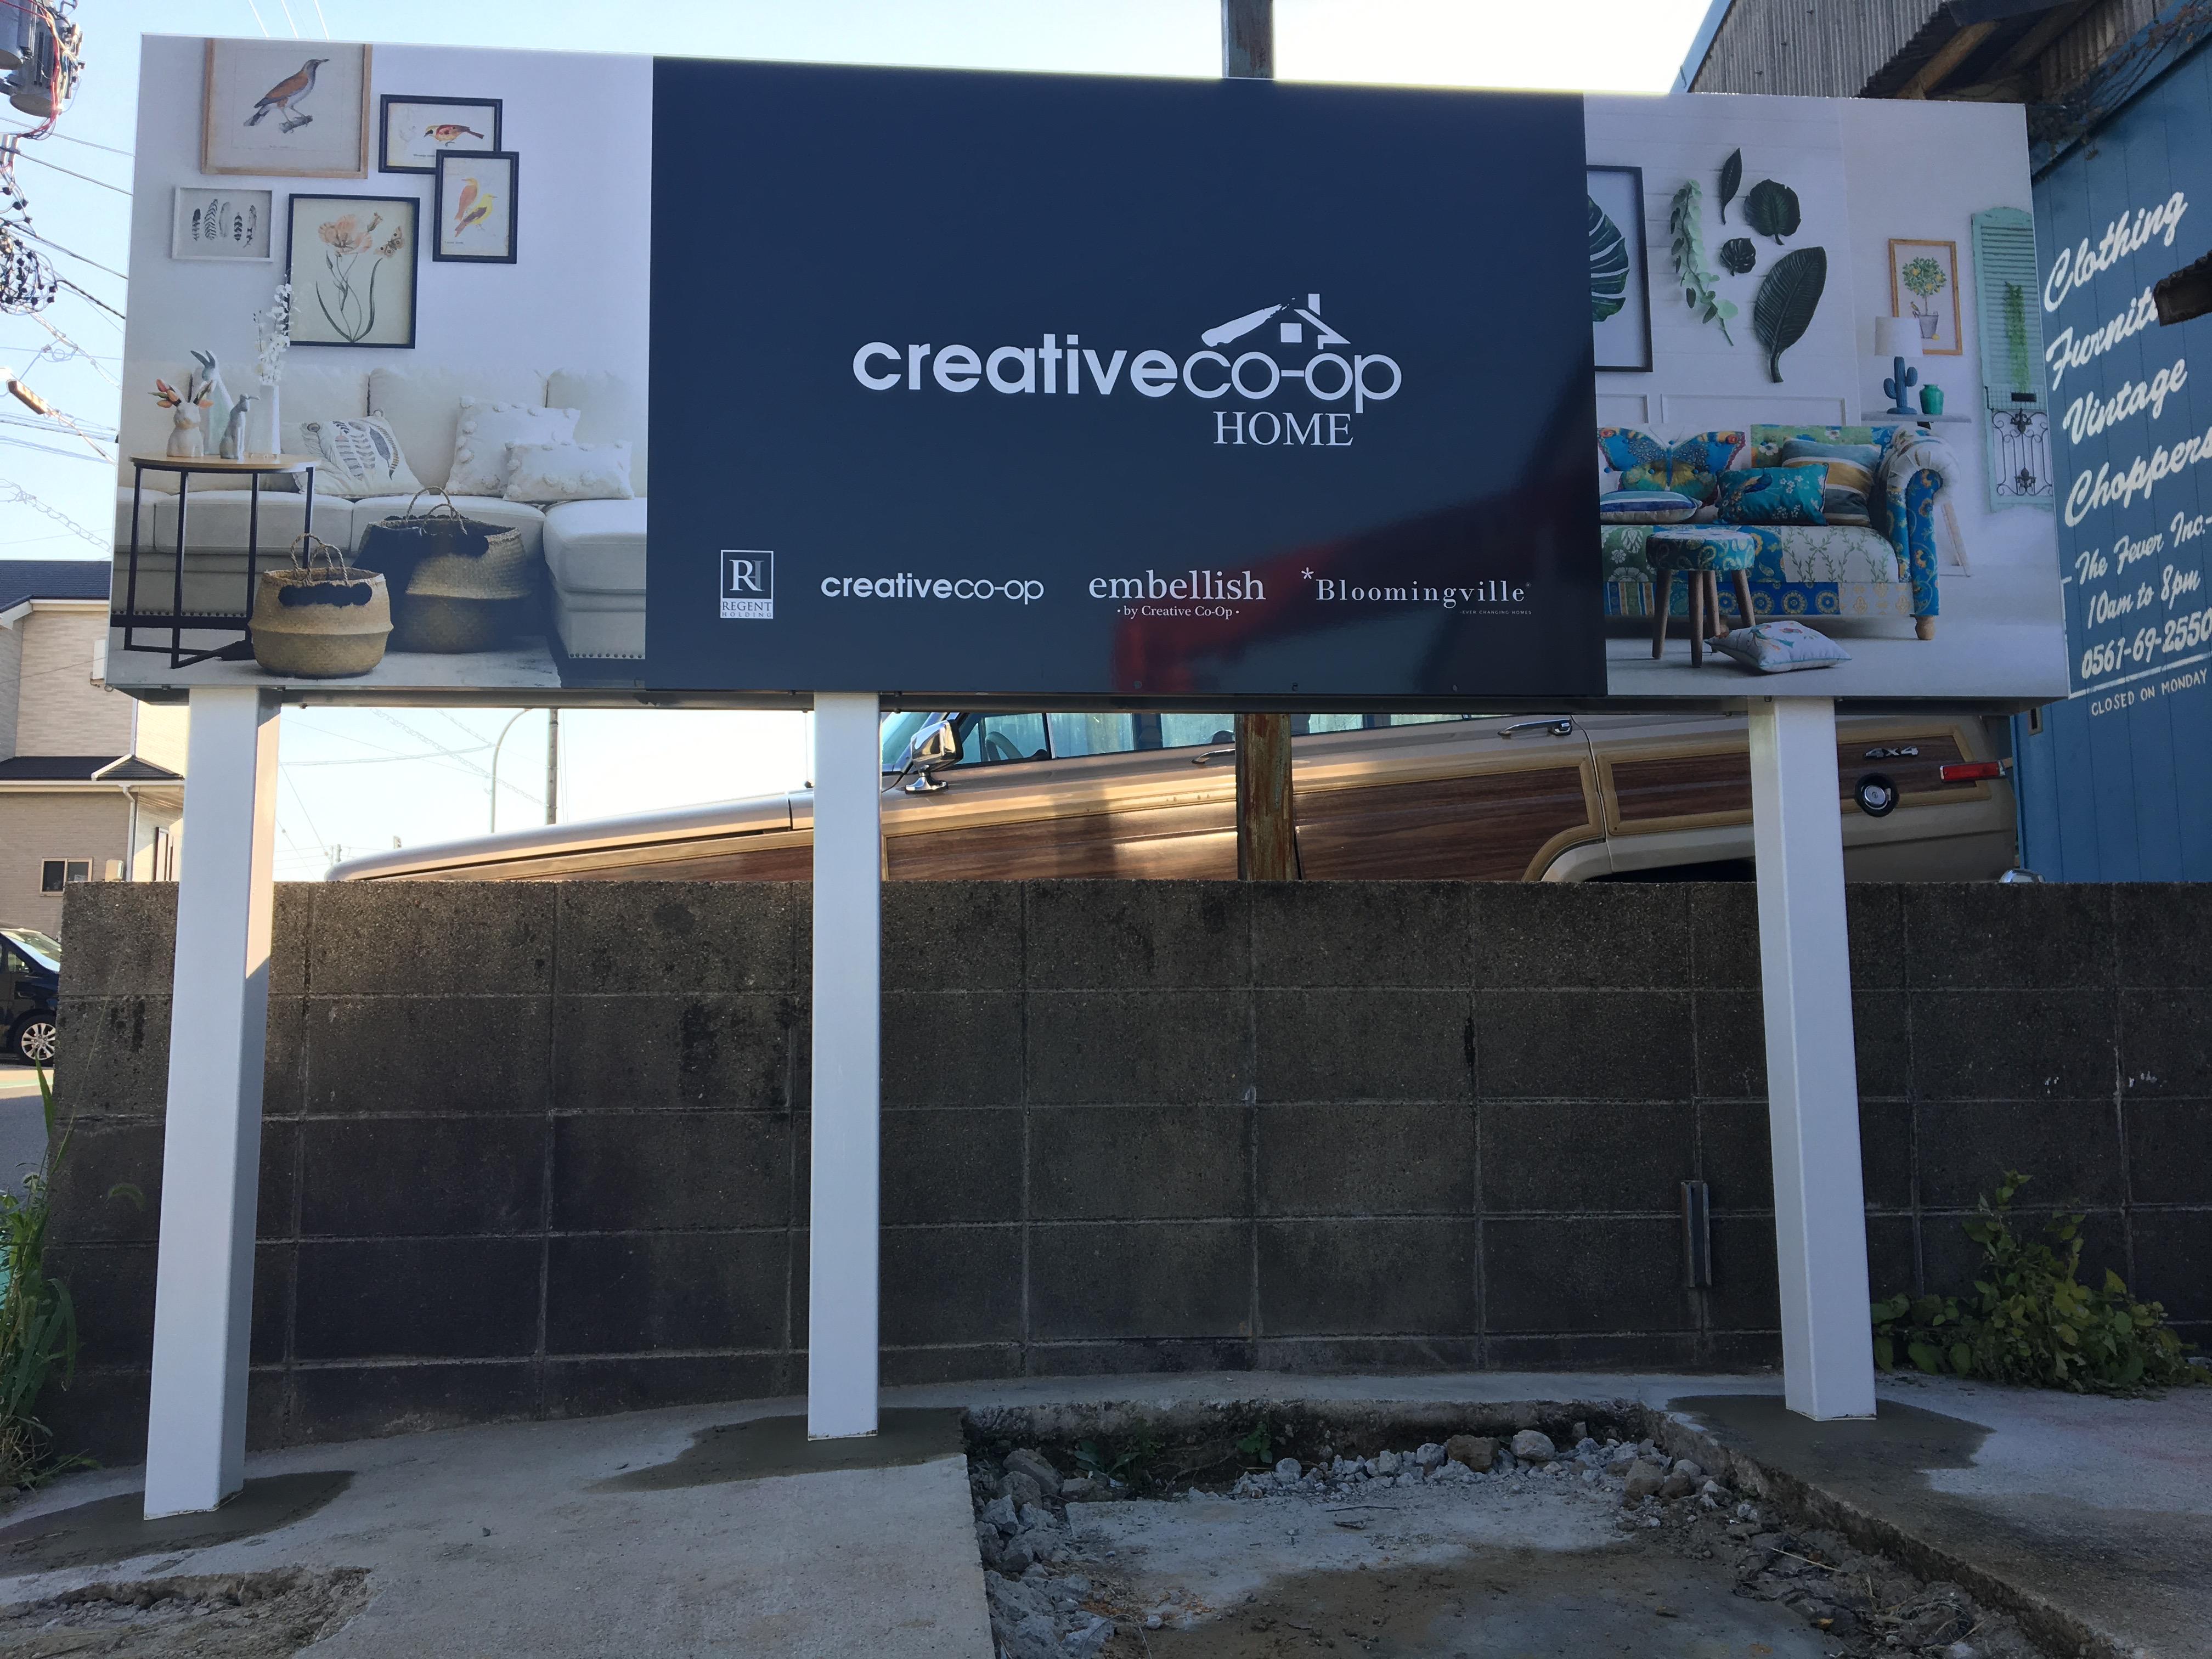 creativeco-opHOME 長久手